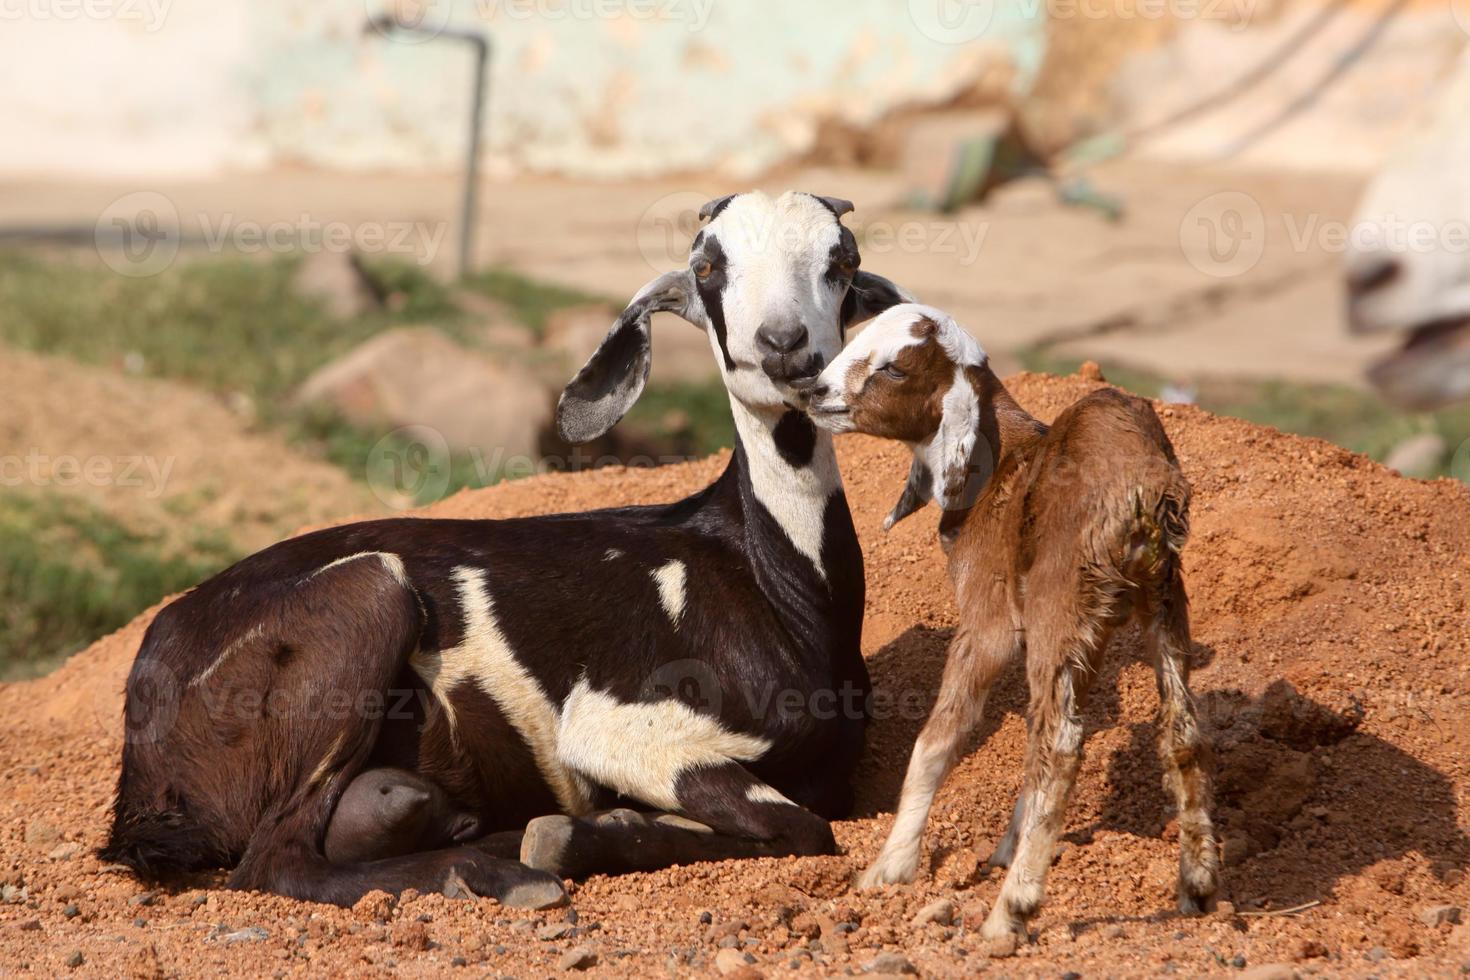 chèvre et chevreau à madhya pradesh, inde photo